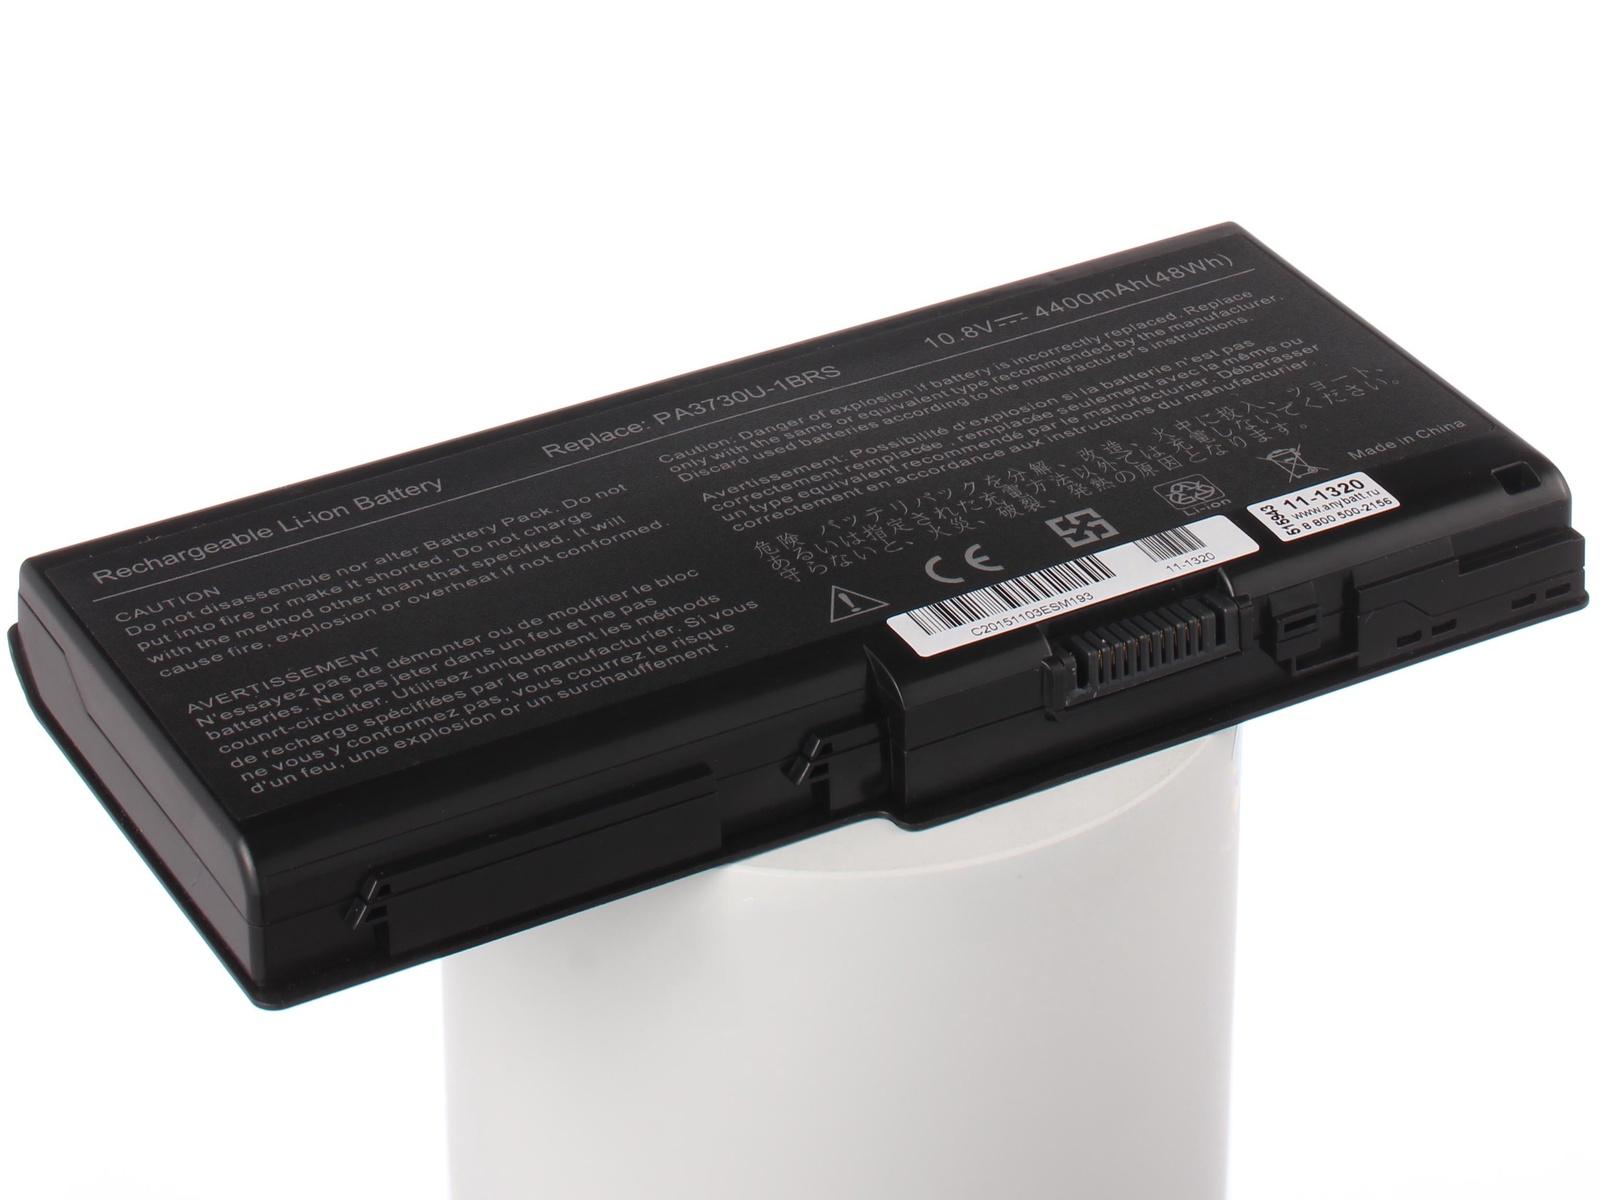 Аккумулятор для ноутбука AnyBatt для ToshiBa Qosmio X500, Qosmio X500-123, Satellite P500, Satellite P500-1EJ, Qosmio X500-12Z, Qosmio X500-158, Qosmio X500-130, Satellite P505-S8980, Qosmio X500-162, Qosmio X505-Q880 адаптер питания topon 90w 15v 6a для toshiba satellite a100 tecra qosmio pa2521 6 3x3 0мм top ts04